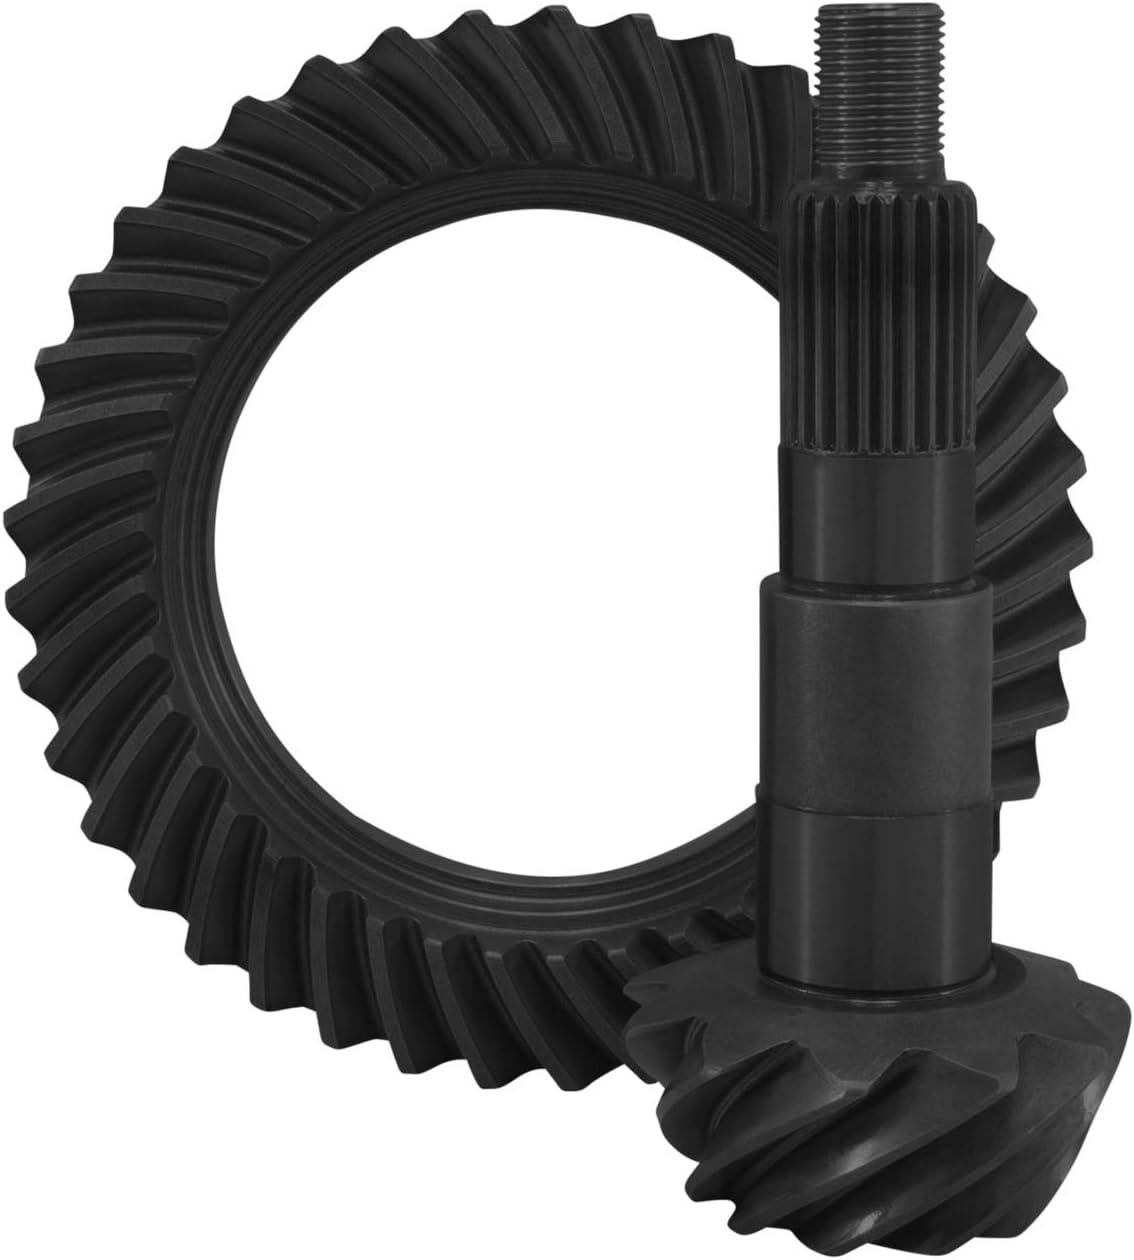 Yukon Gear Axle YG D30R-373R 40% Lowest price challenge OFF Cheap Sale High Pinion Ring Performance